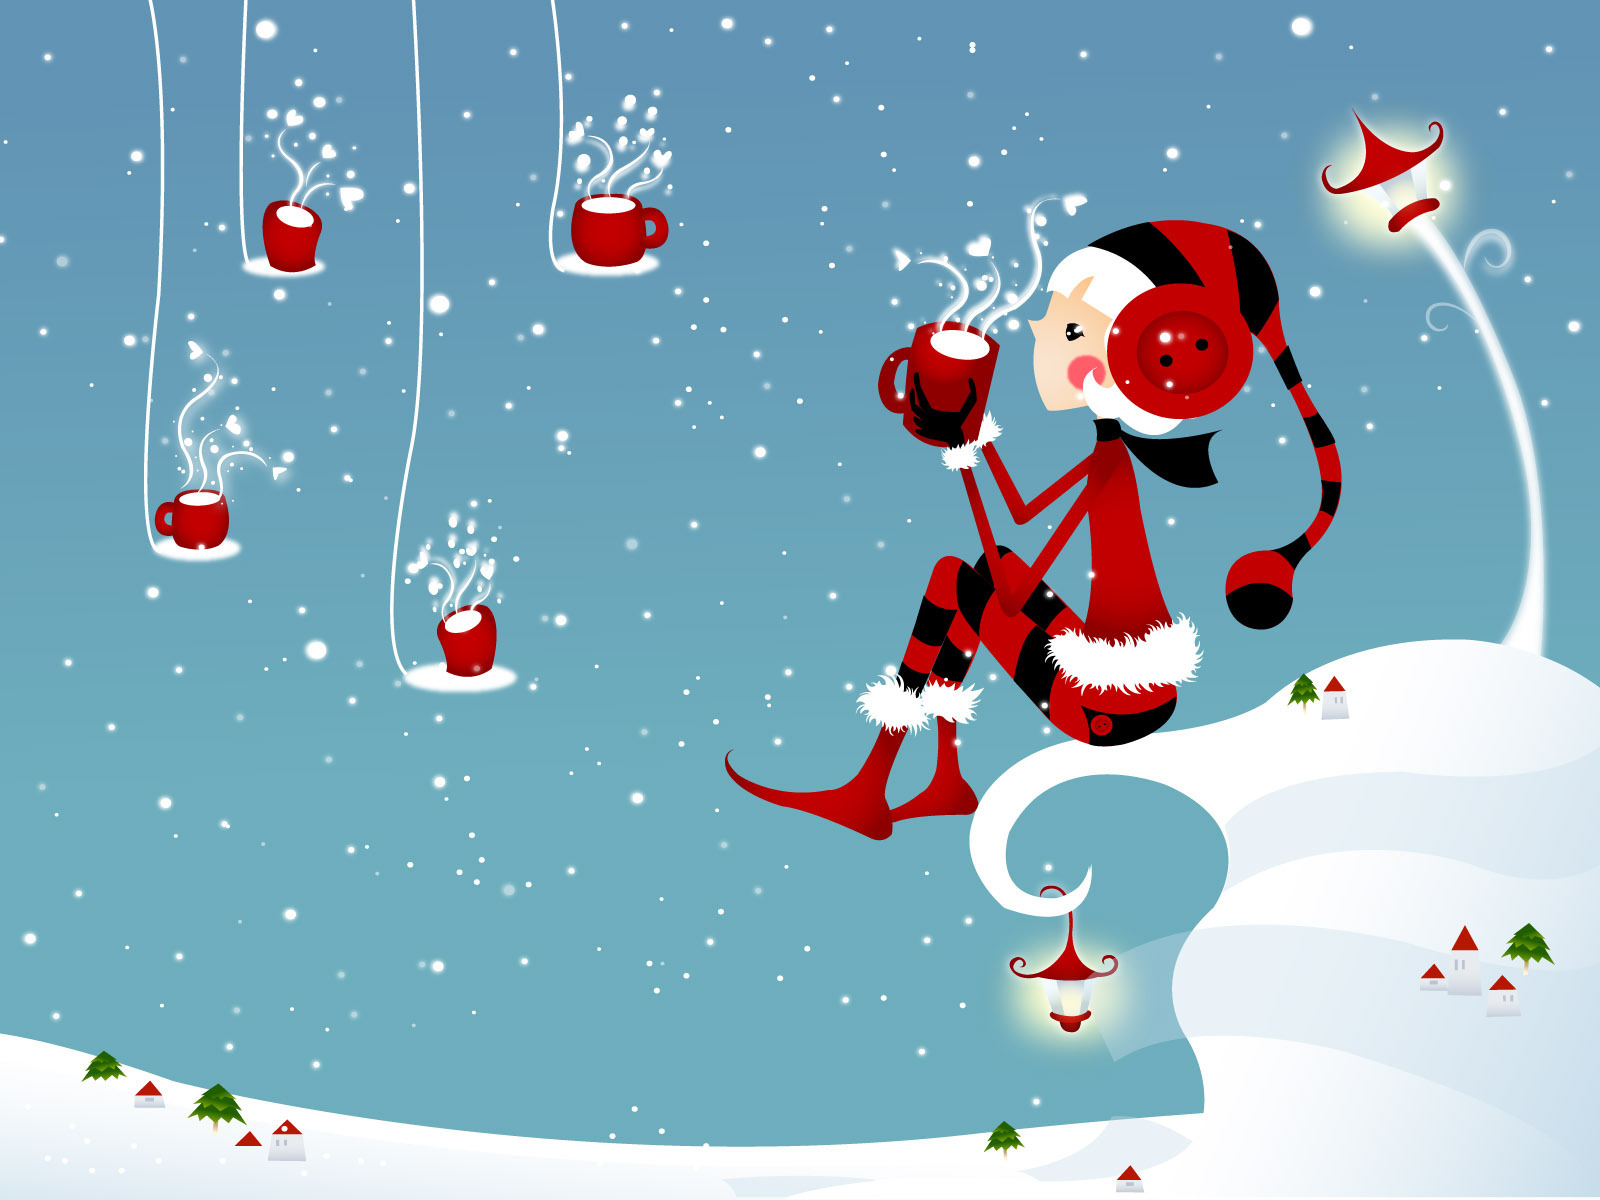 kawaii christmas wallpaper,santa claus,cartoon,christmas,illustration,fictional character